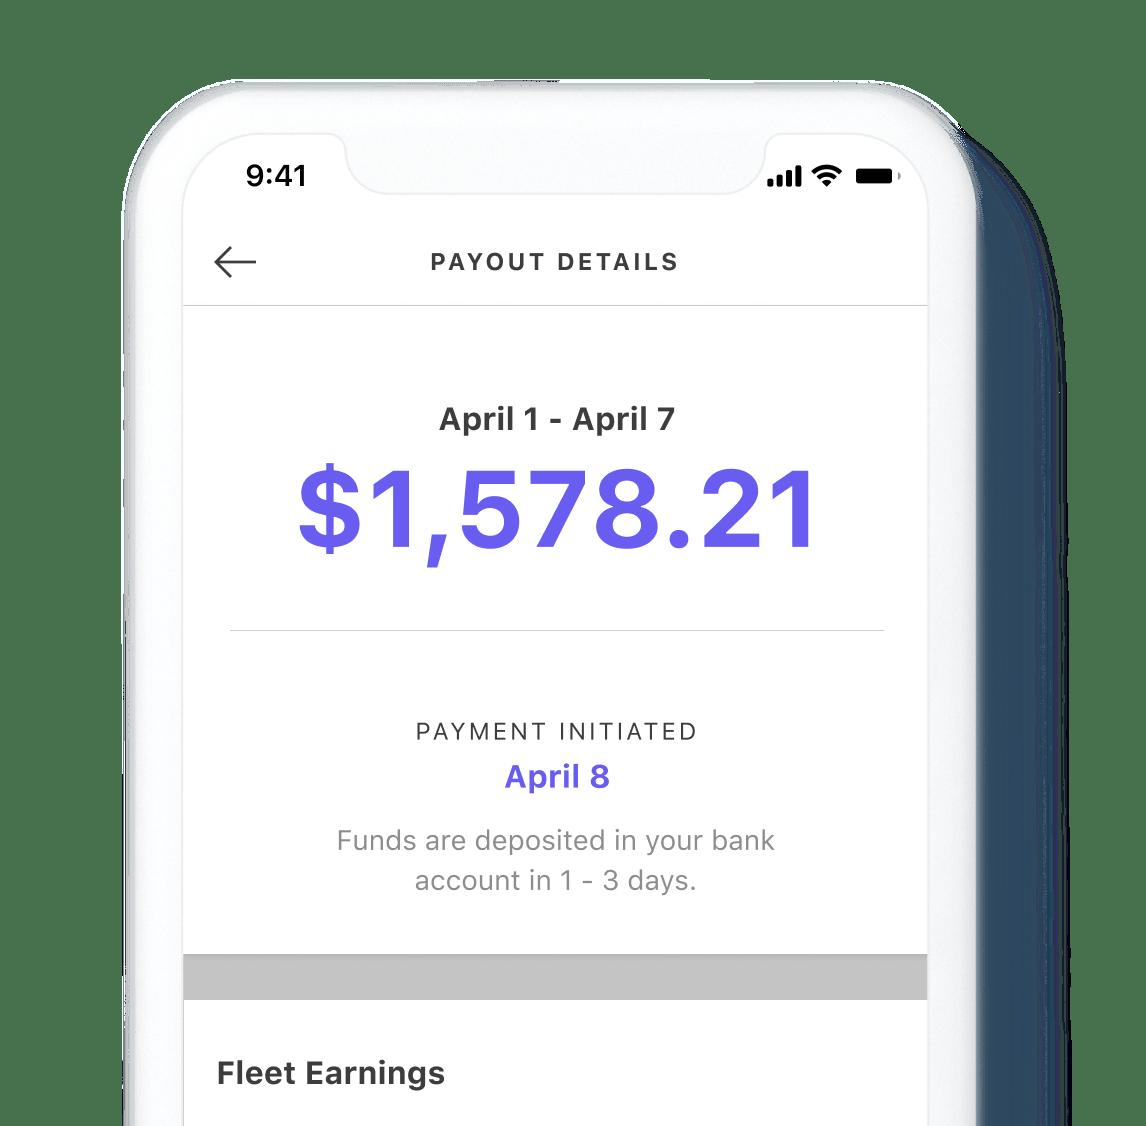 Bird app displaying fleet earnings payout details view